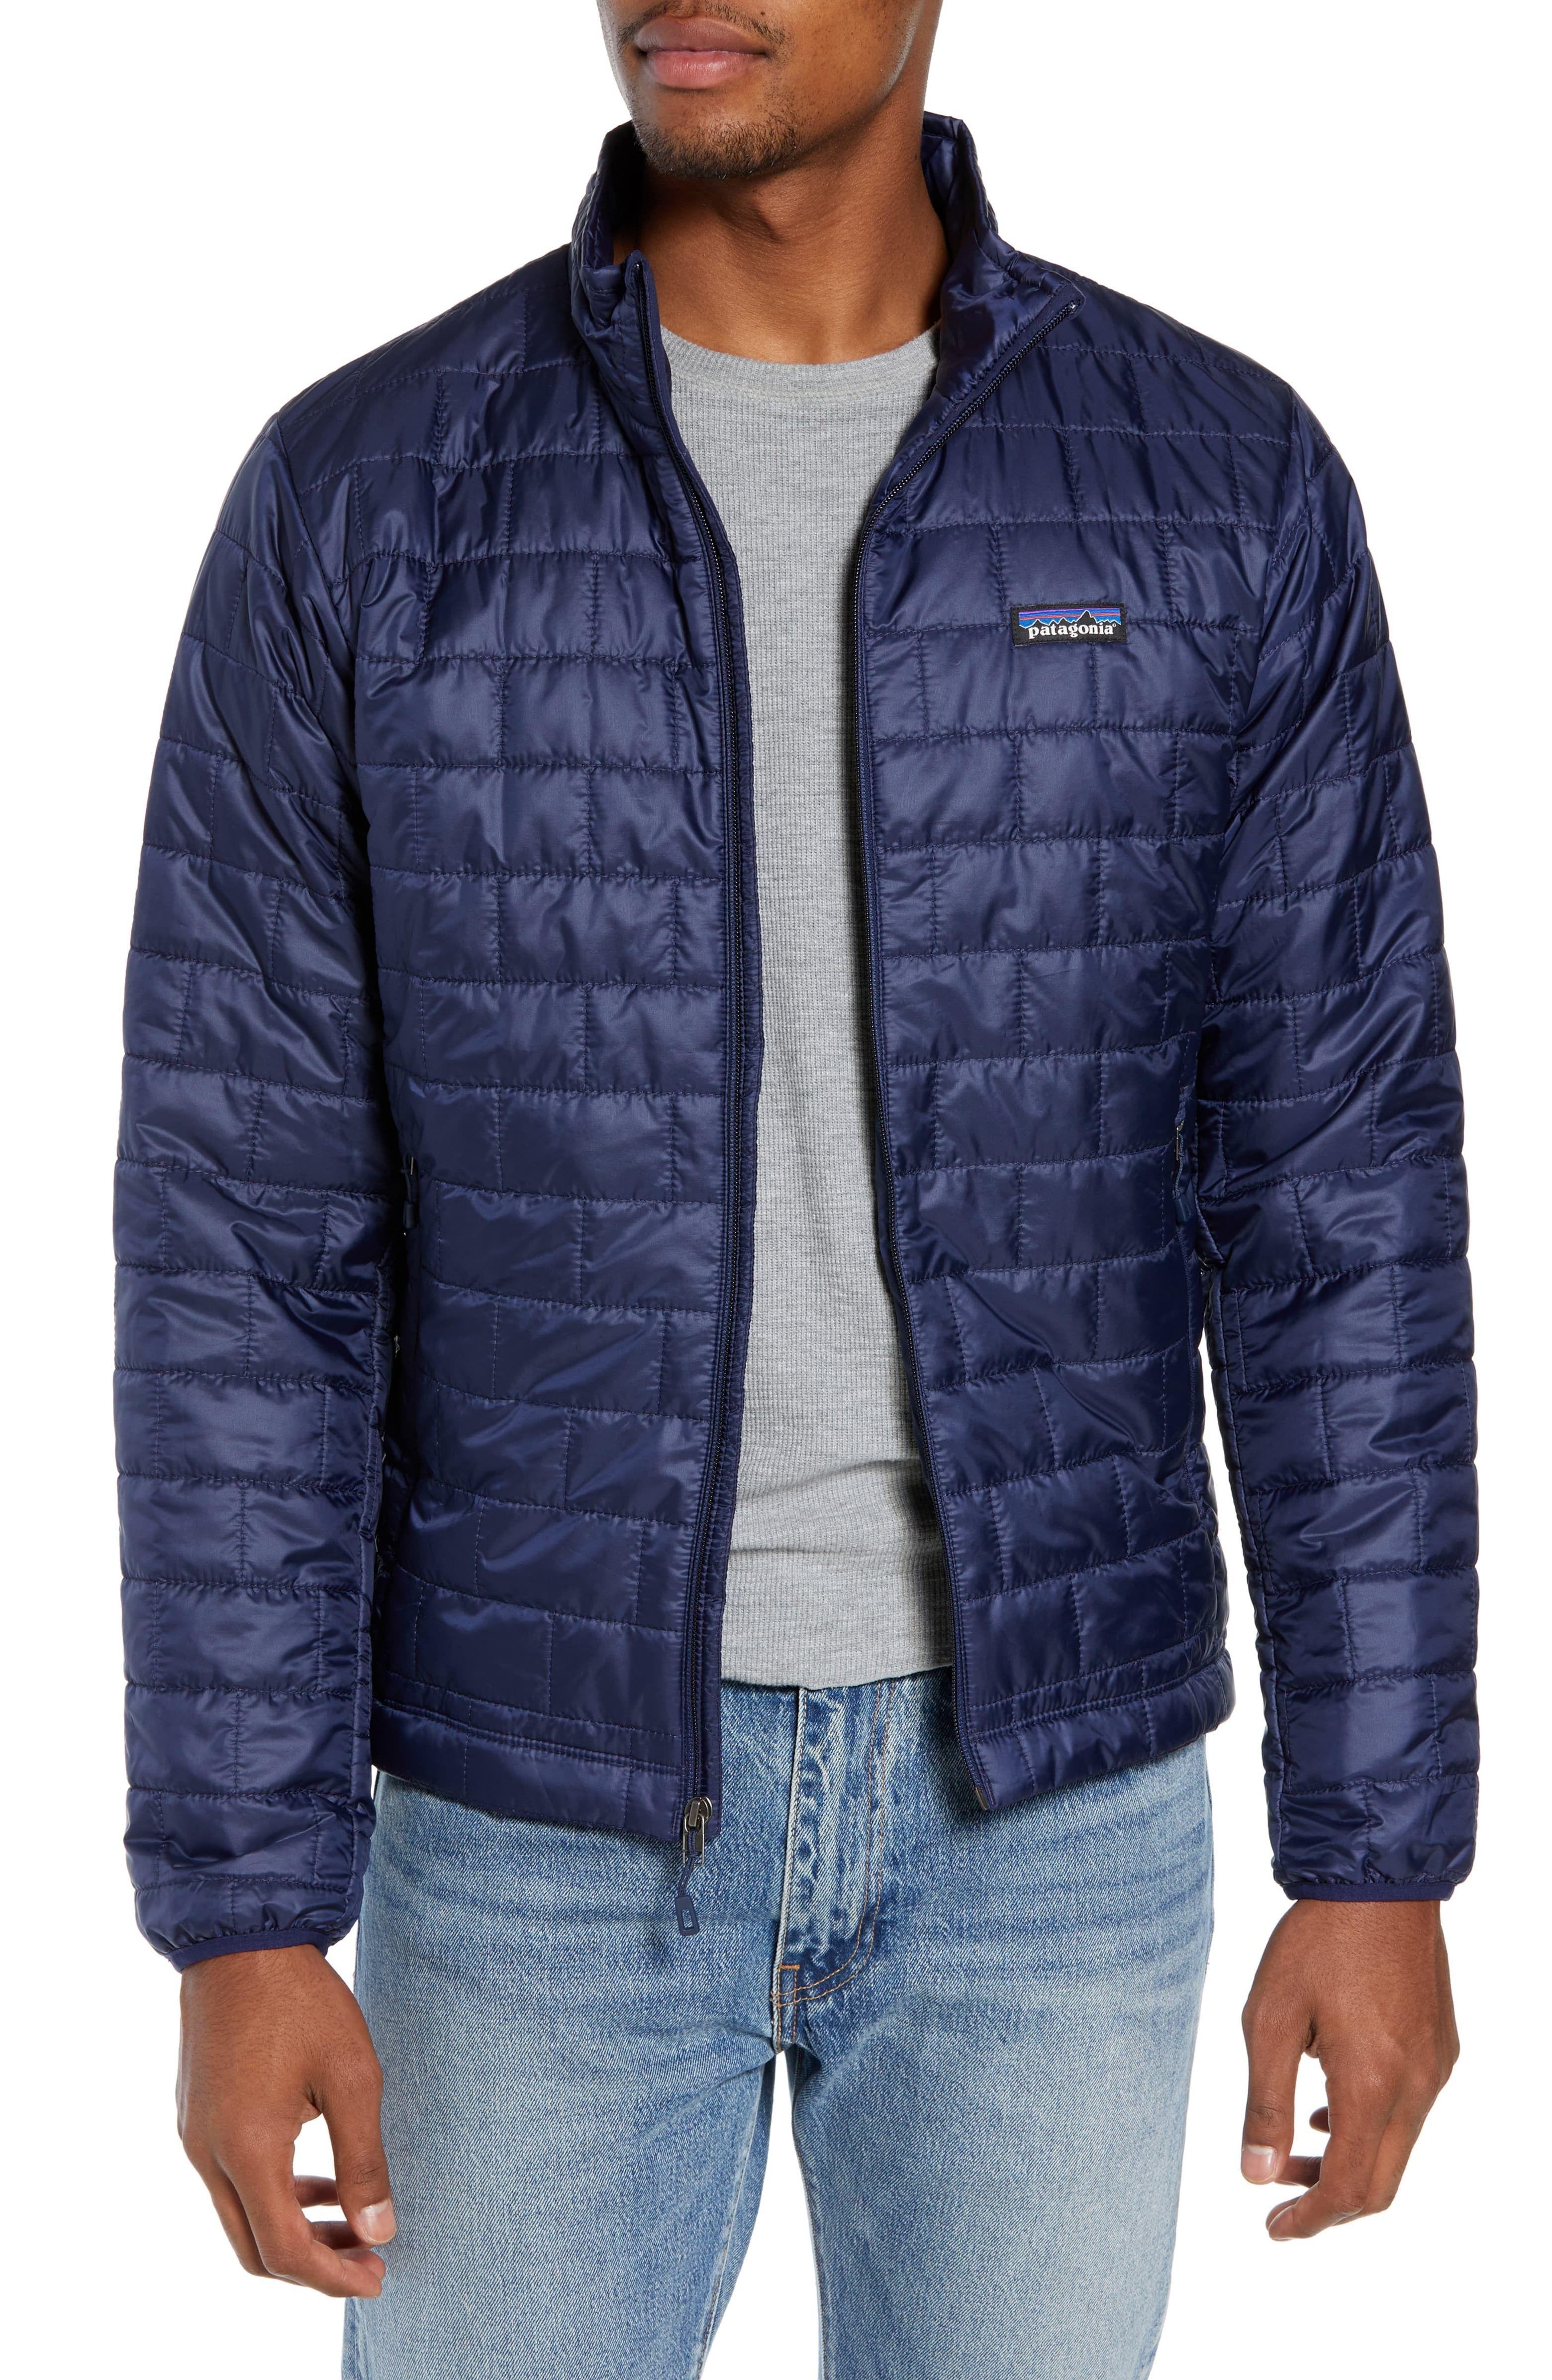 Nano Puff® Water Resistant Jacket Water resistant jacket